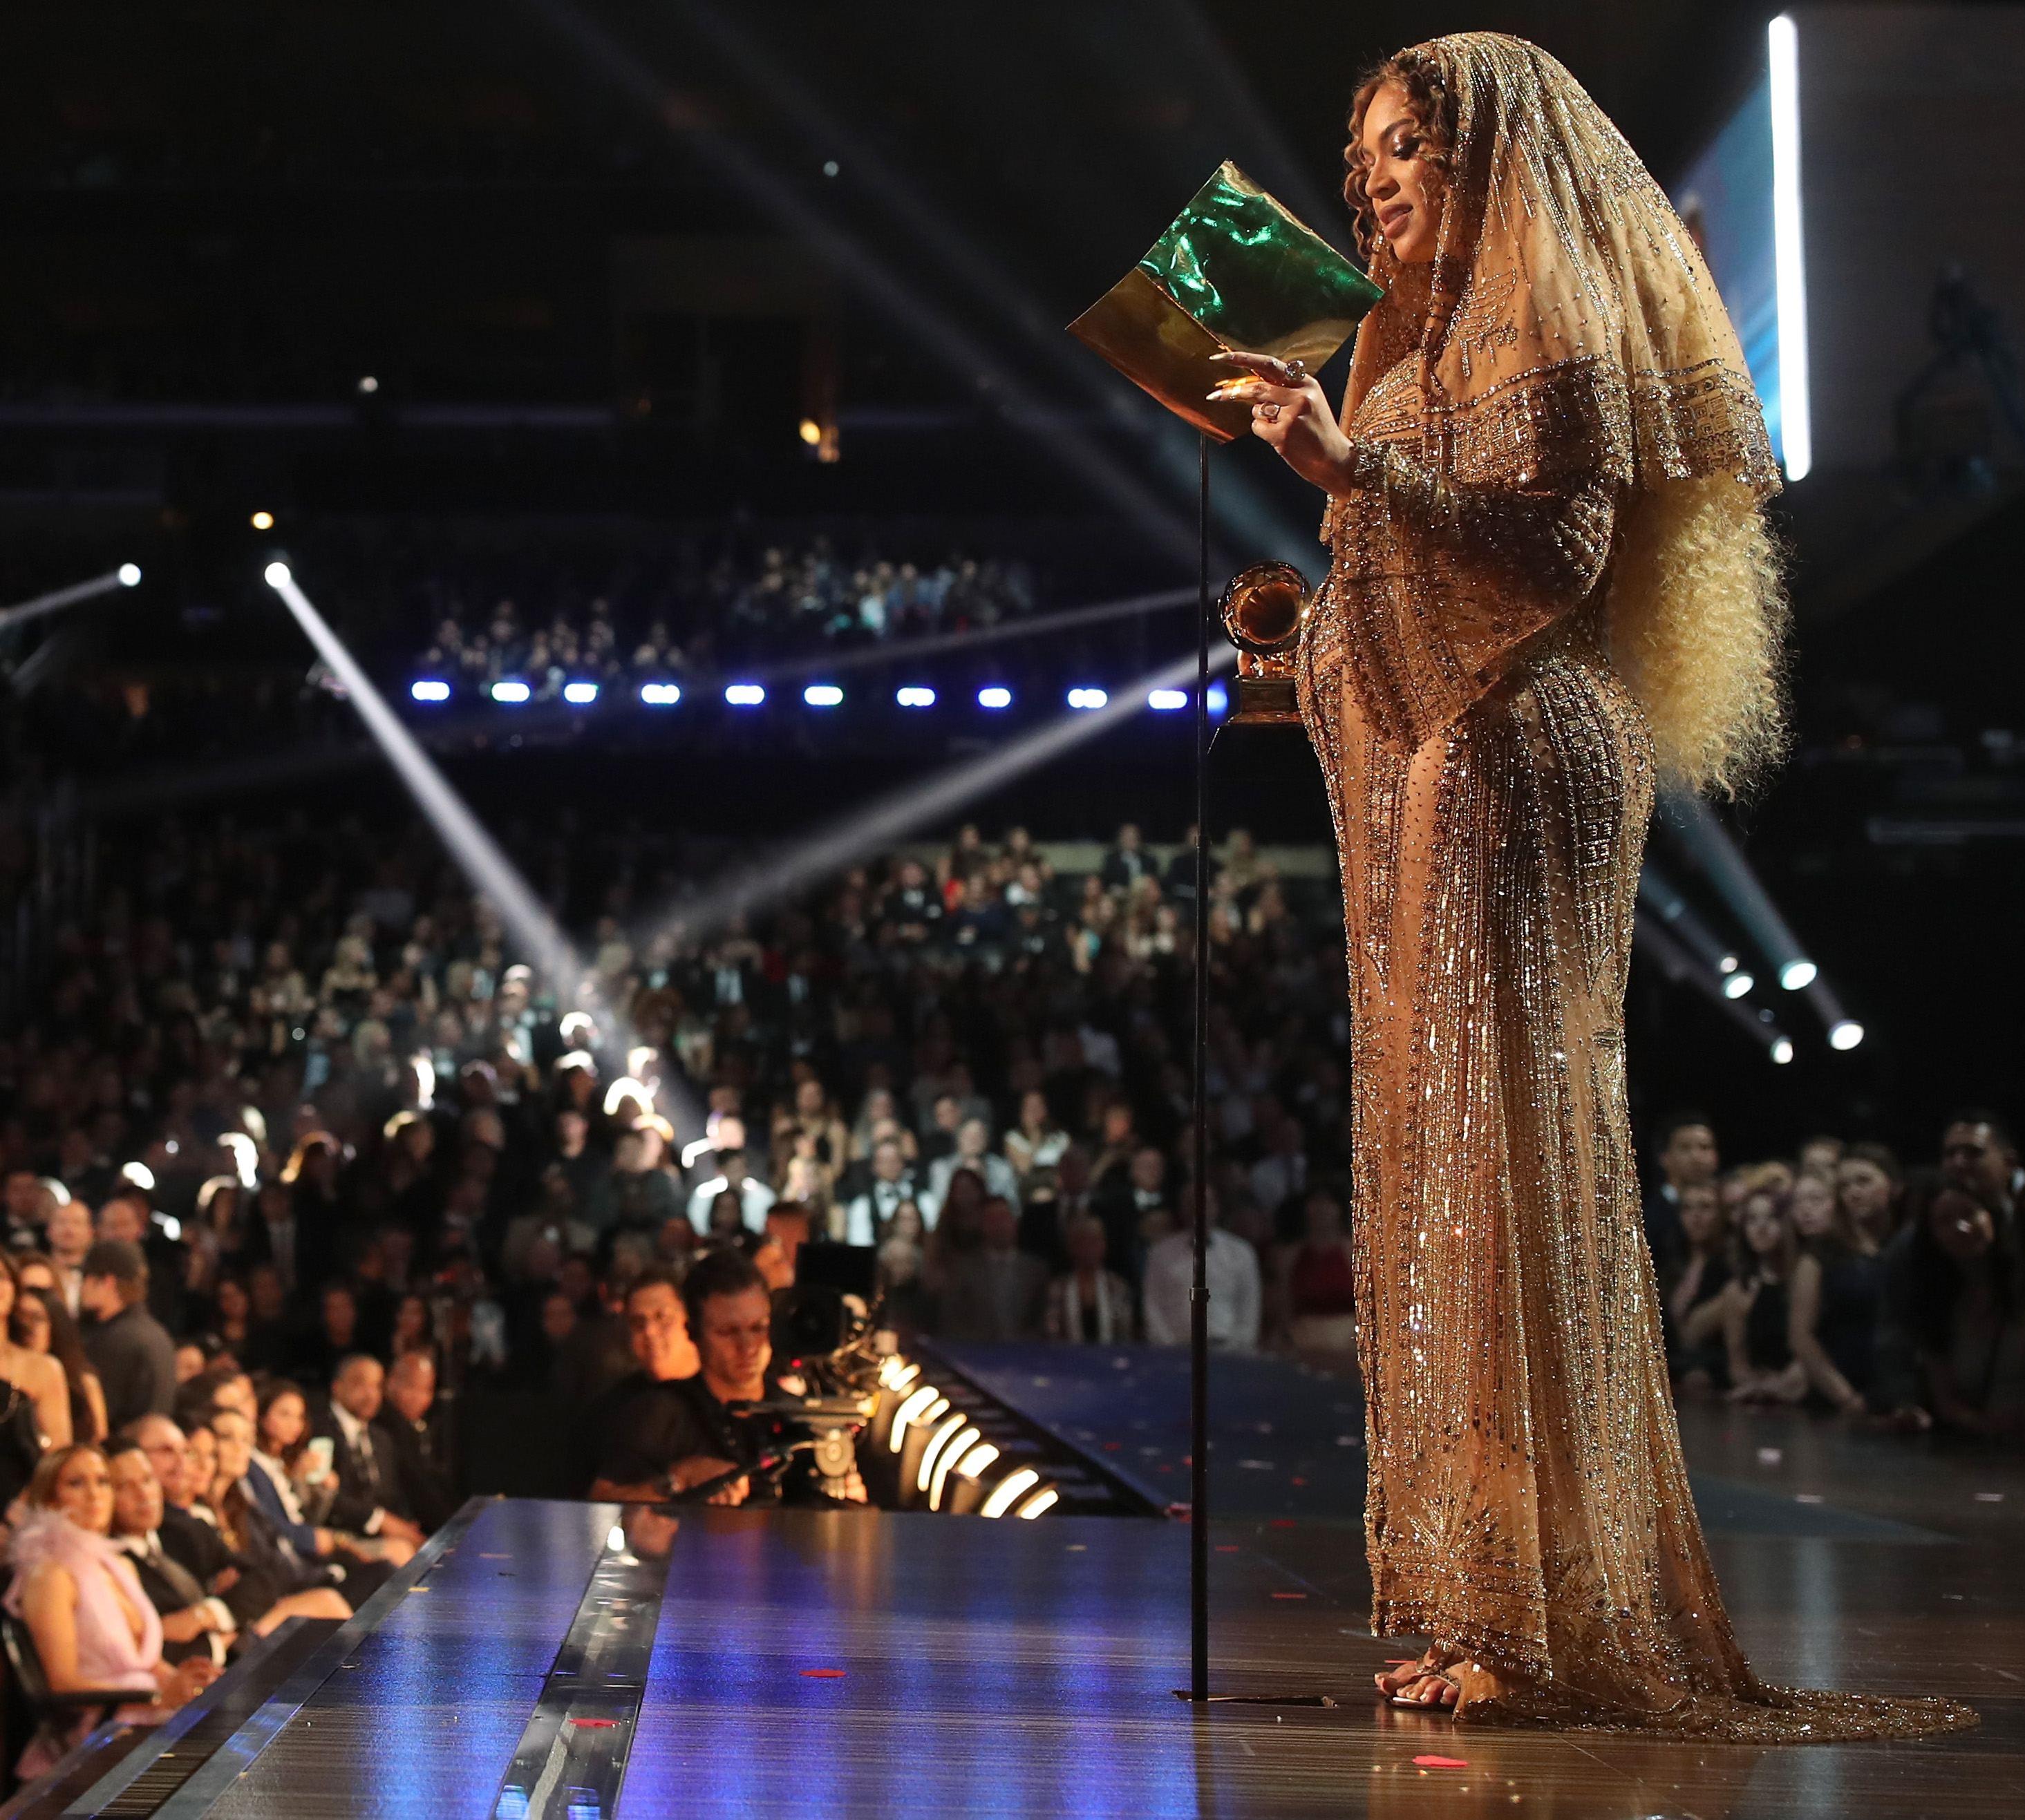 Beyoncé reads her acceptance speech during the 2017 Grammy Awards.